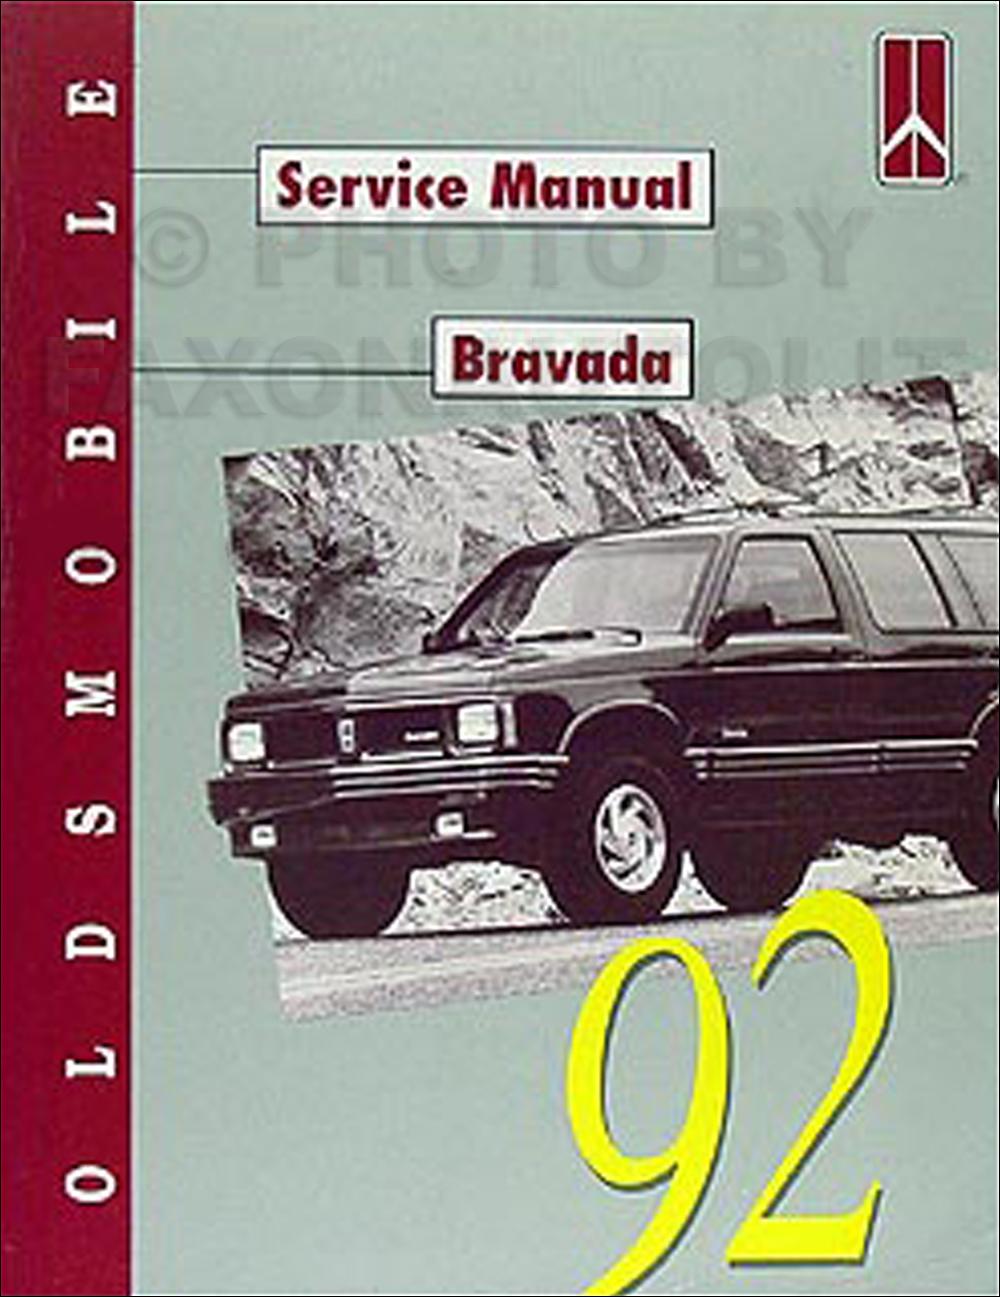 1992 oldsmobile bravada repair shop manual original rh faxonautoliterature com 1999 oldsmobile bravada repair manual 1997 Oldsmobile Bravada